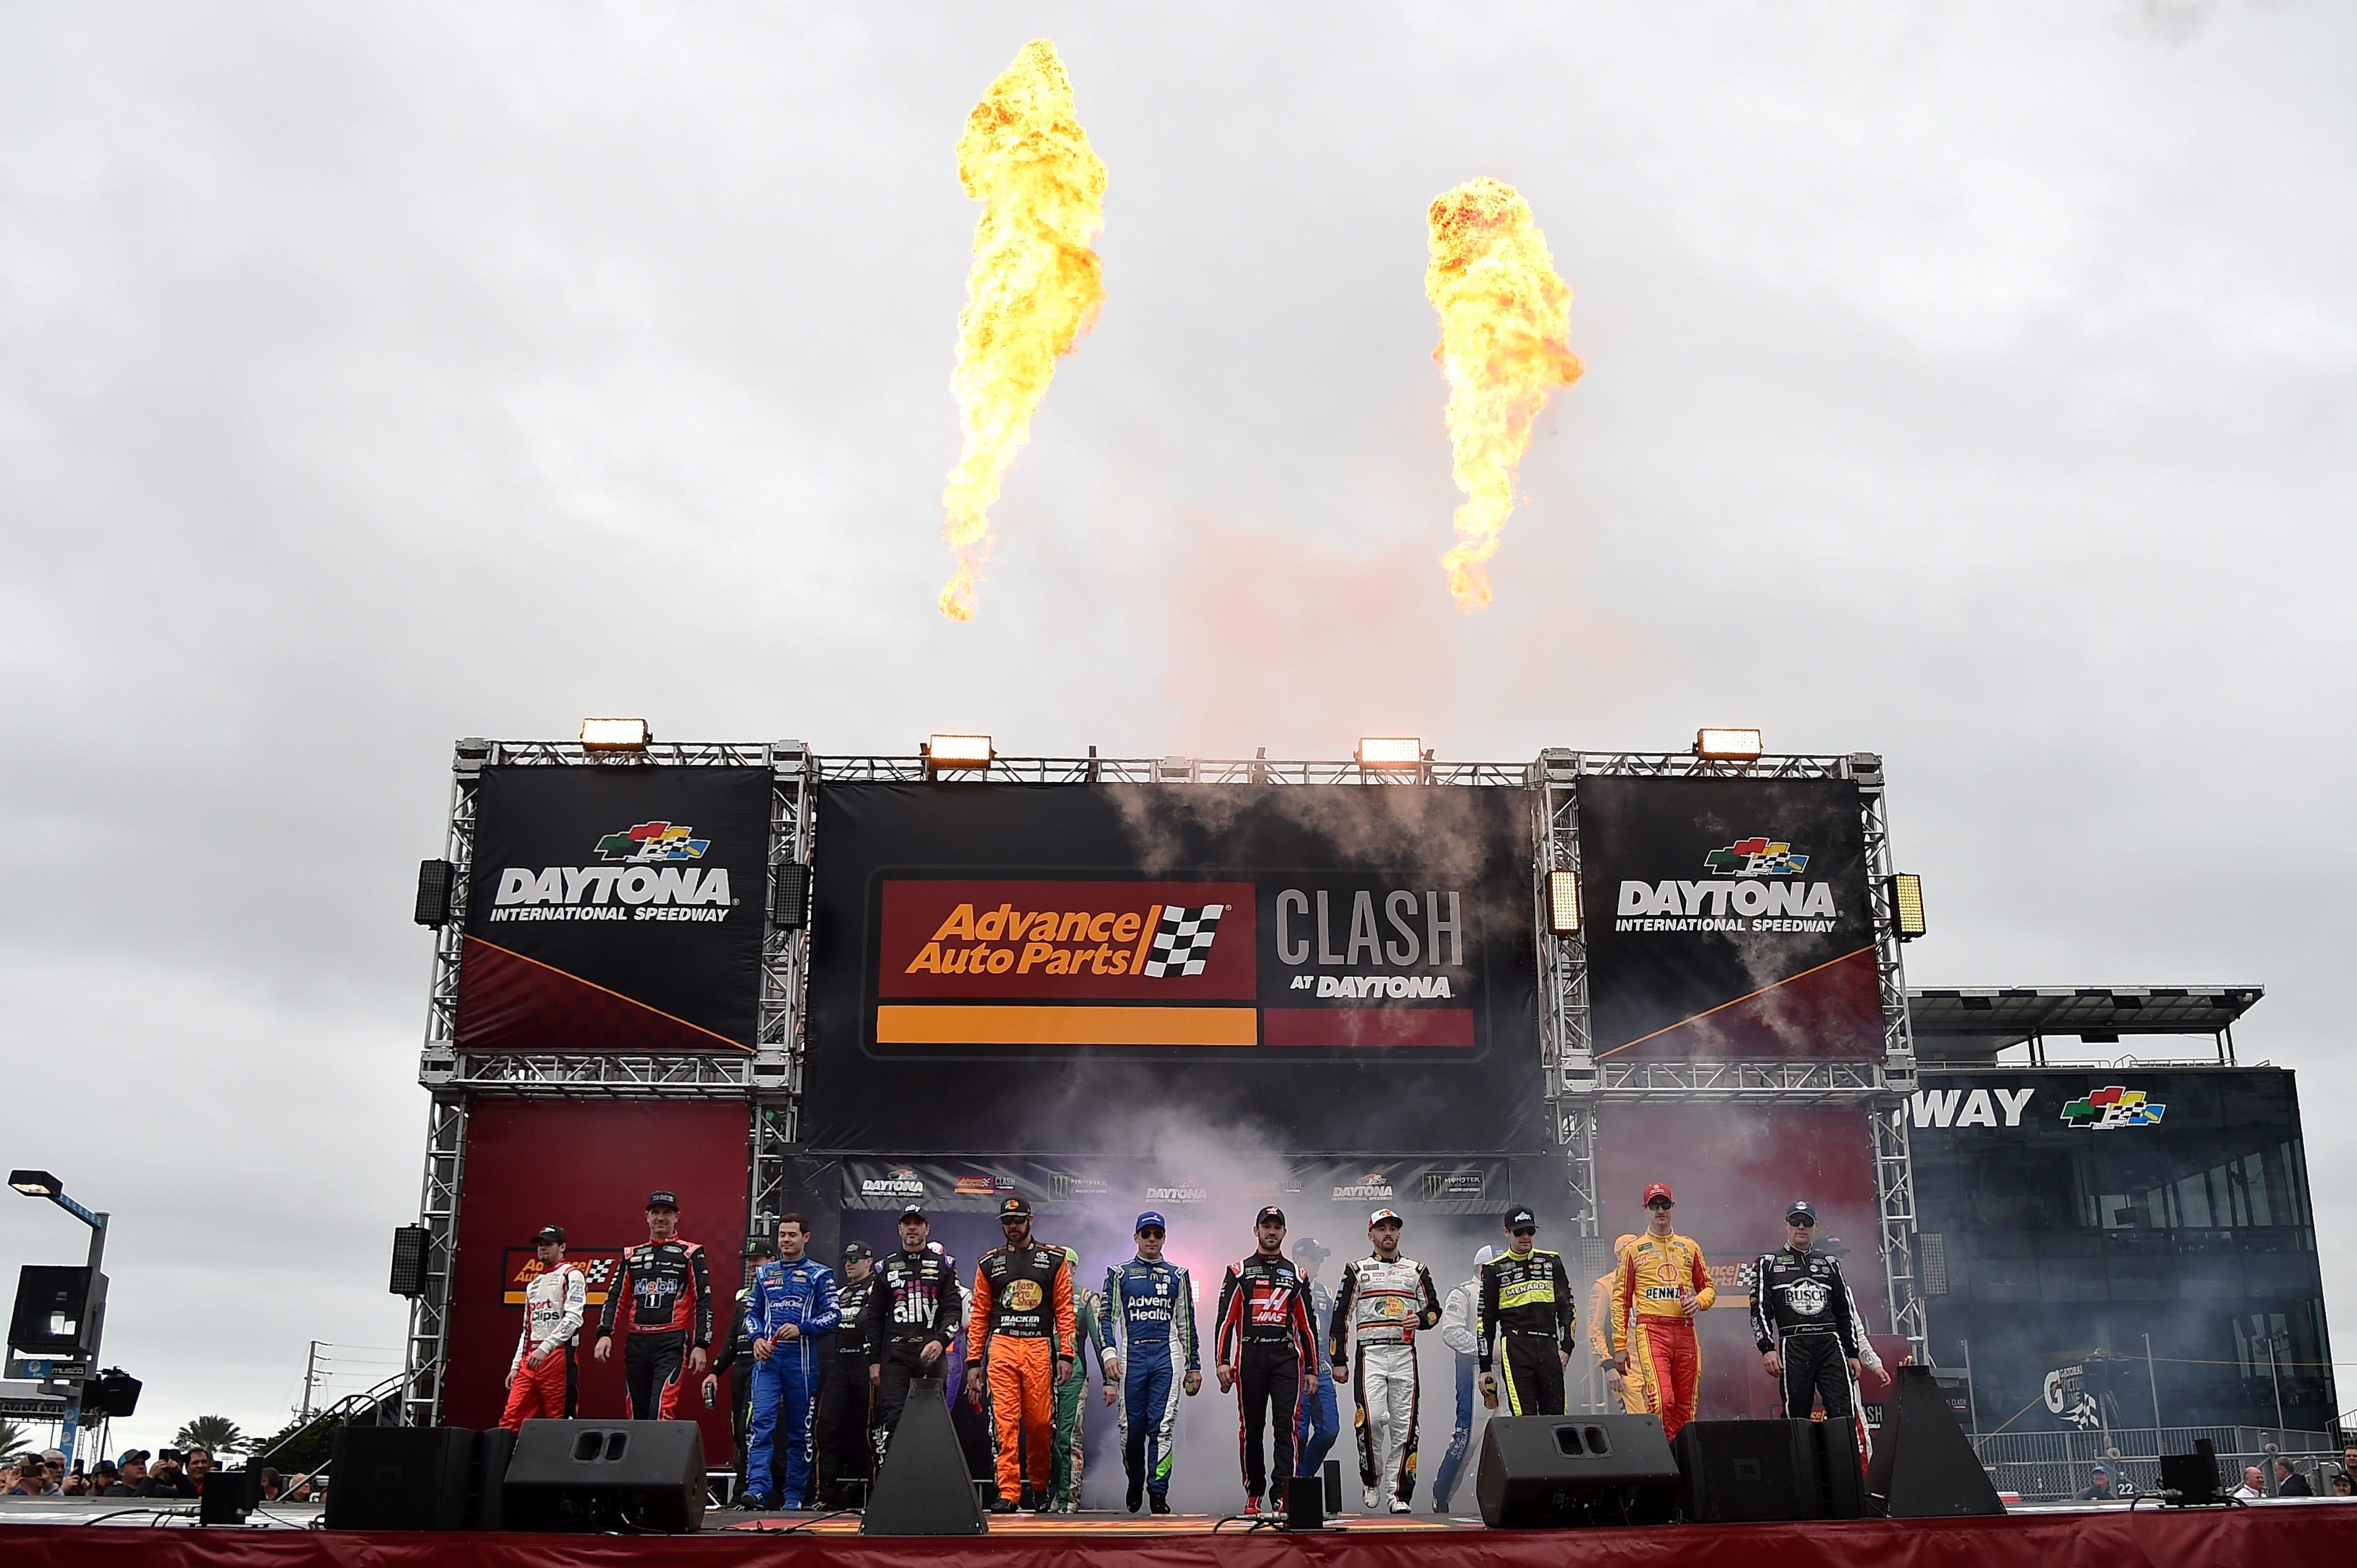 Analysis: Joe Gibbs Racing seeks to replicate NASCAR dominance in 2020 season